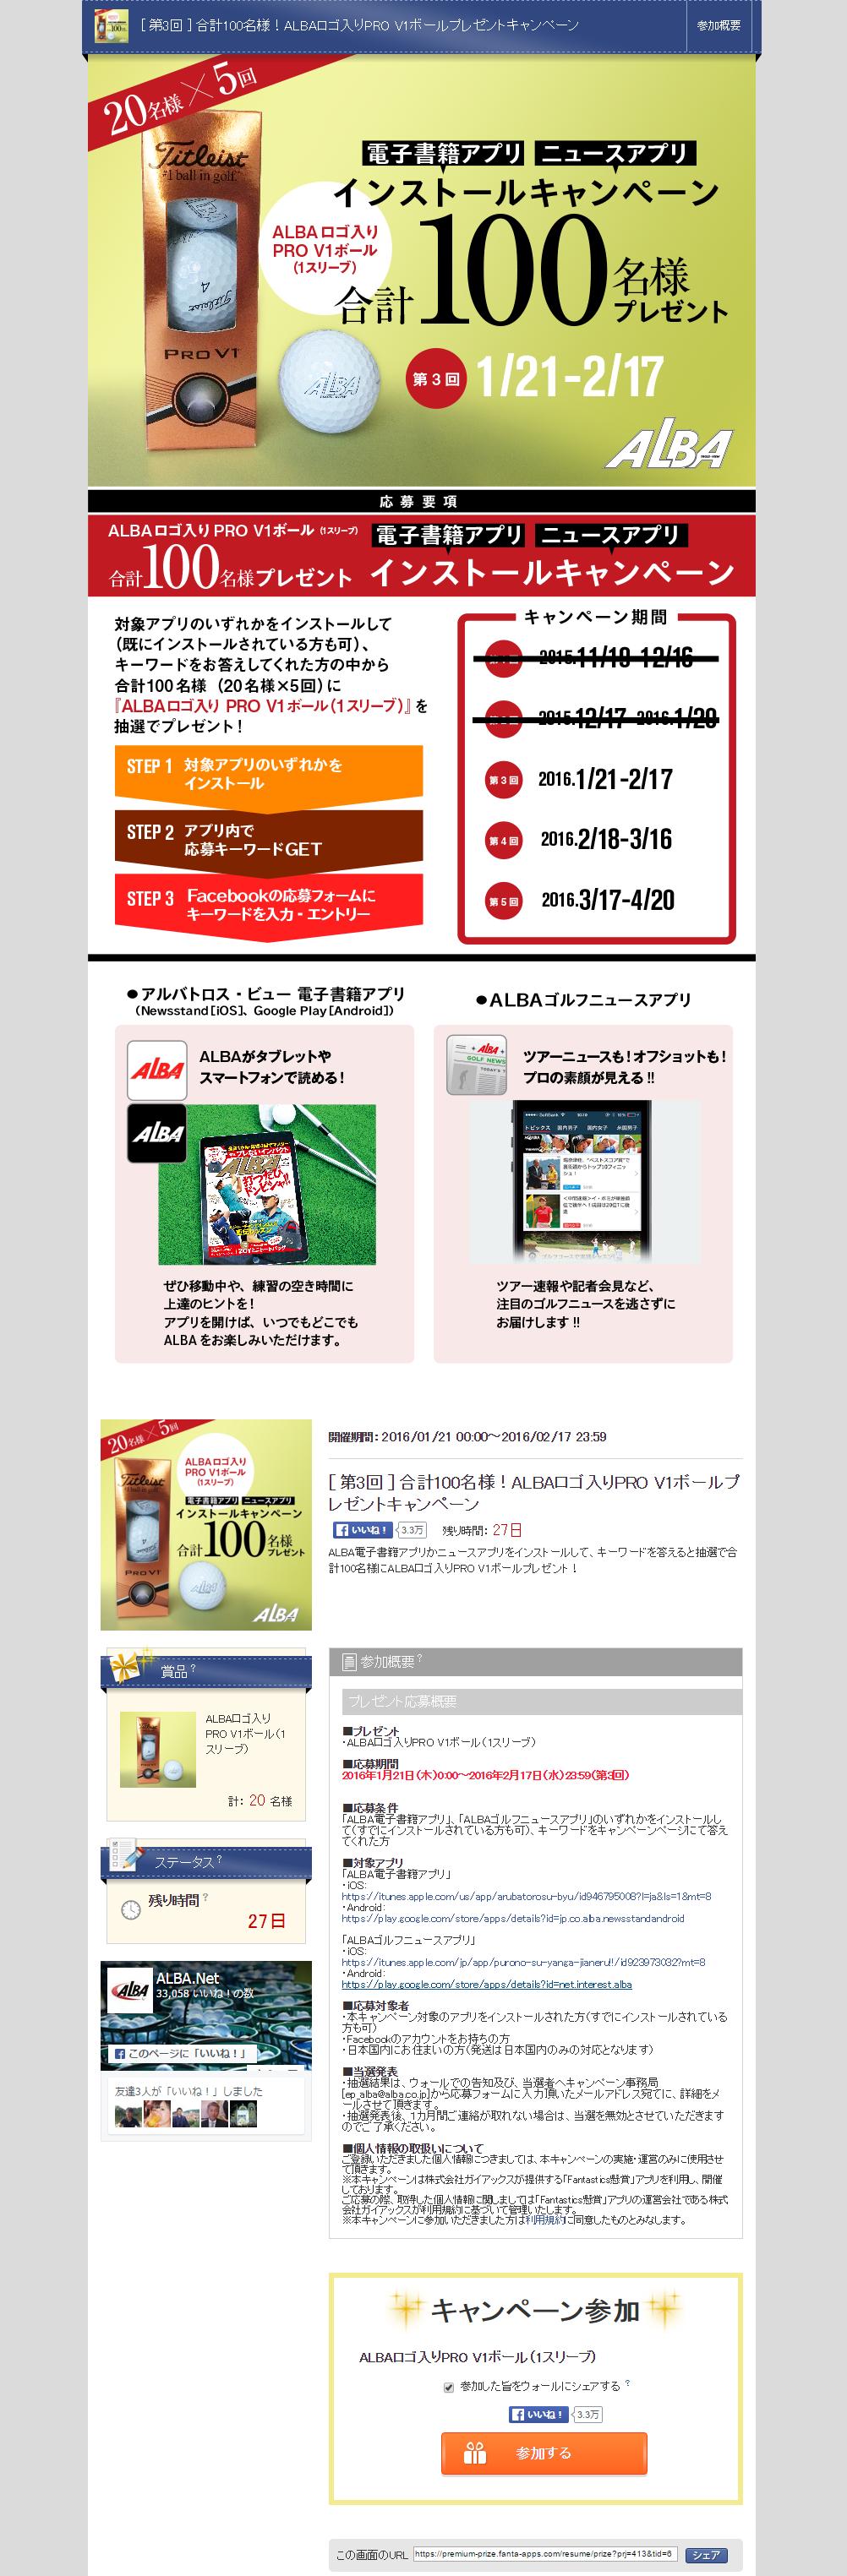 Fantastics「アンケート型」懸賞アプリ(株式会社ALBA様)